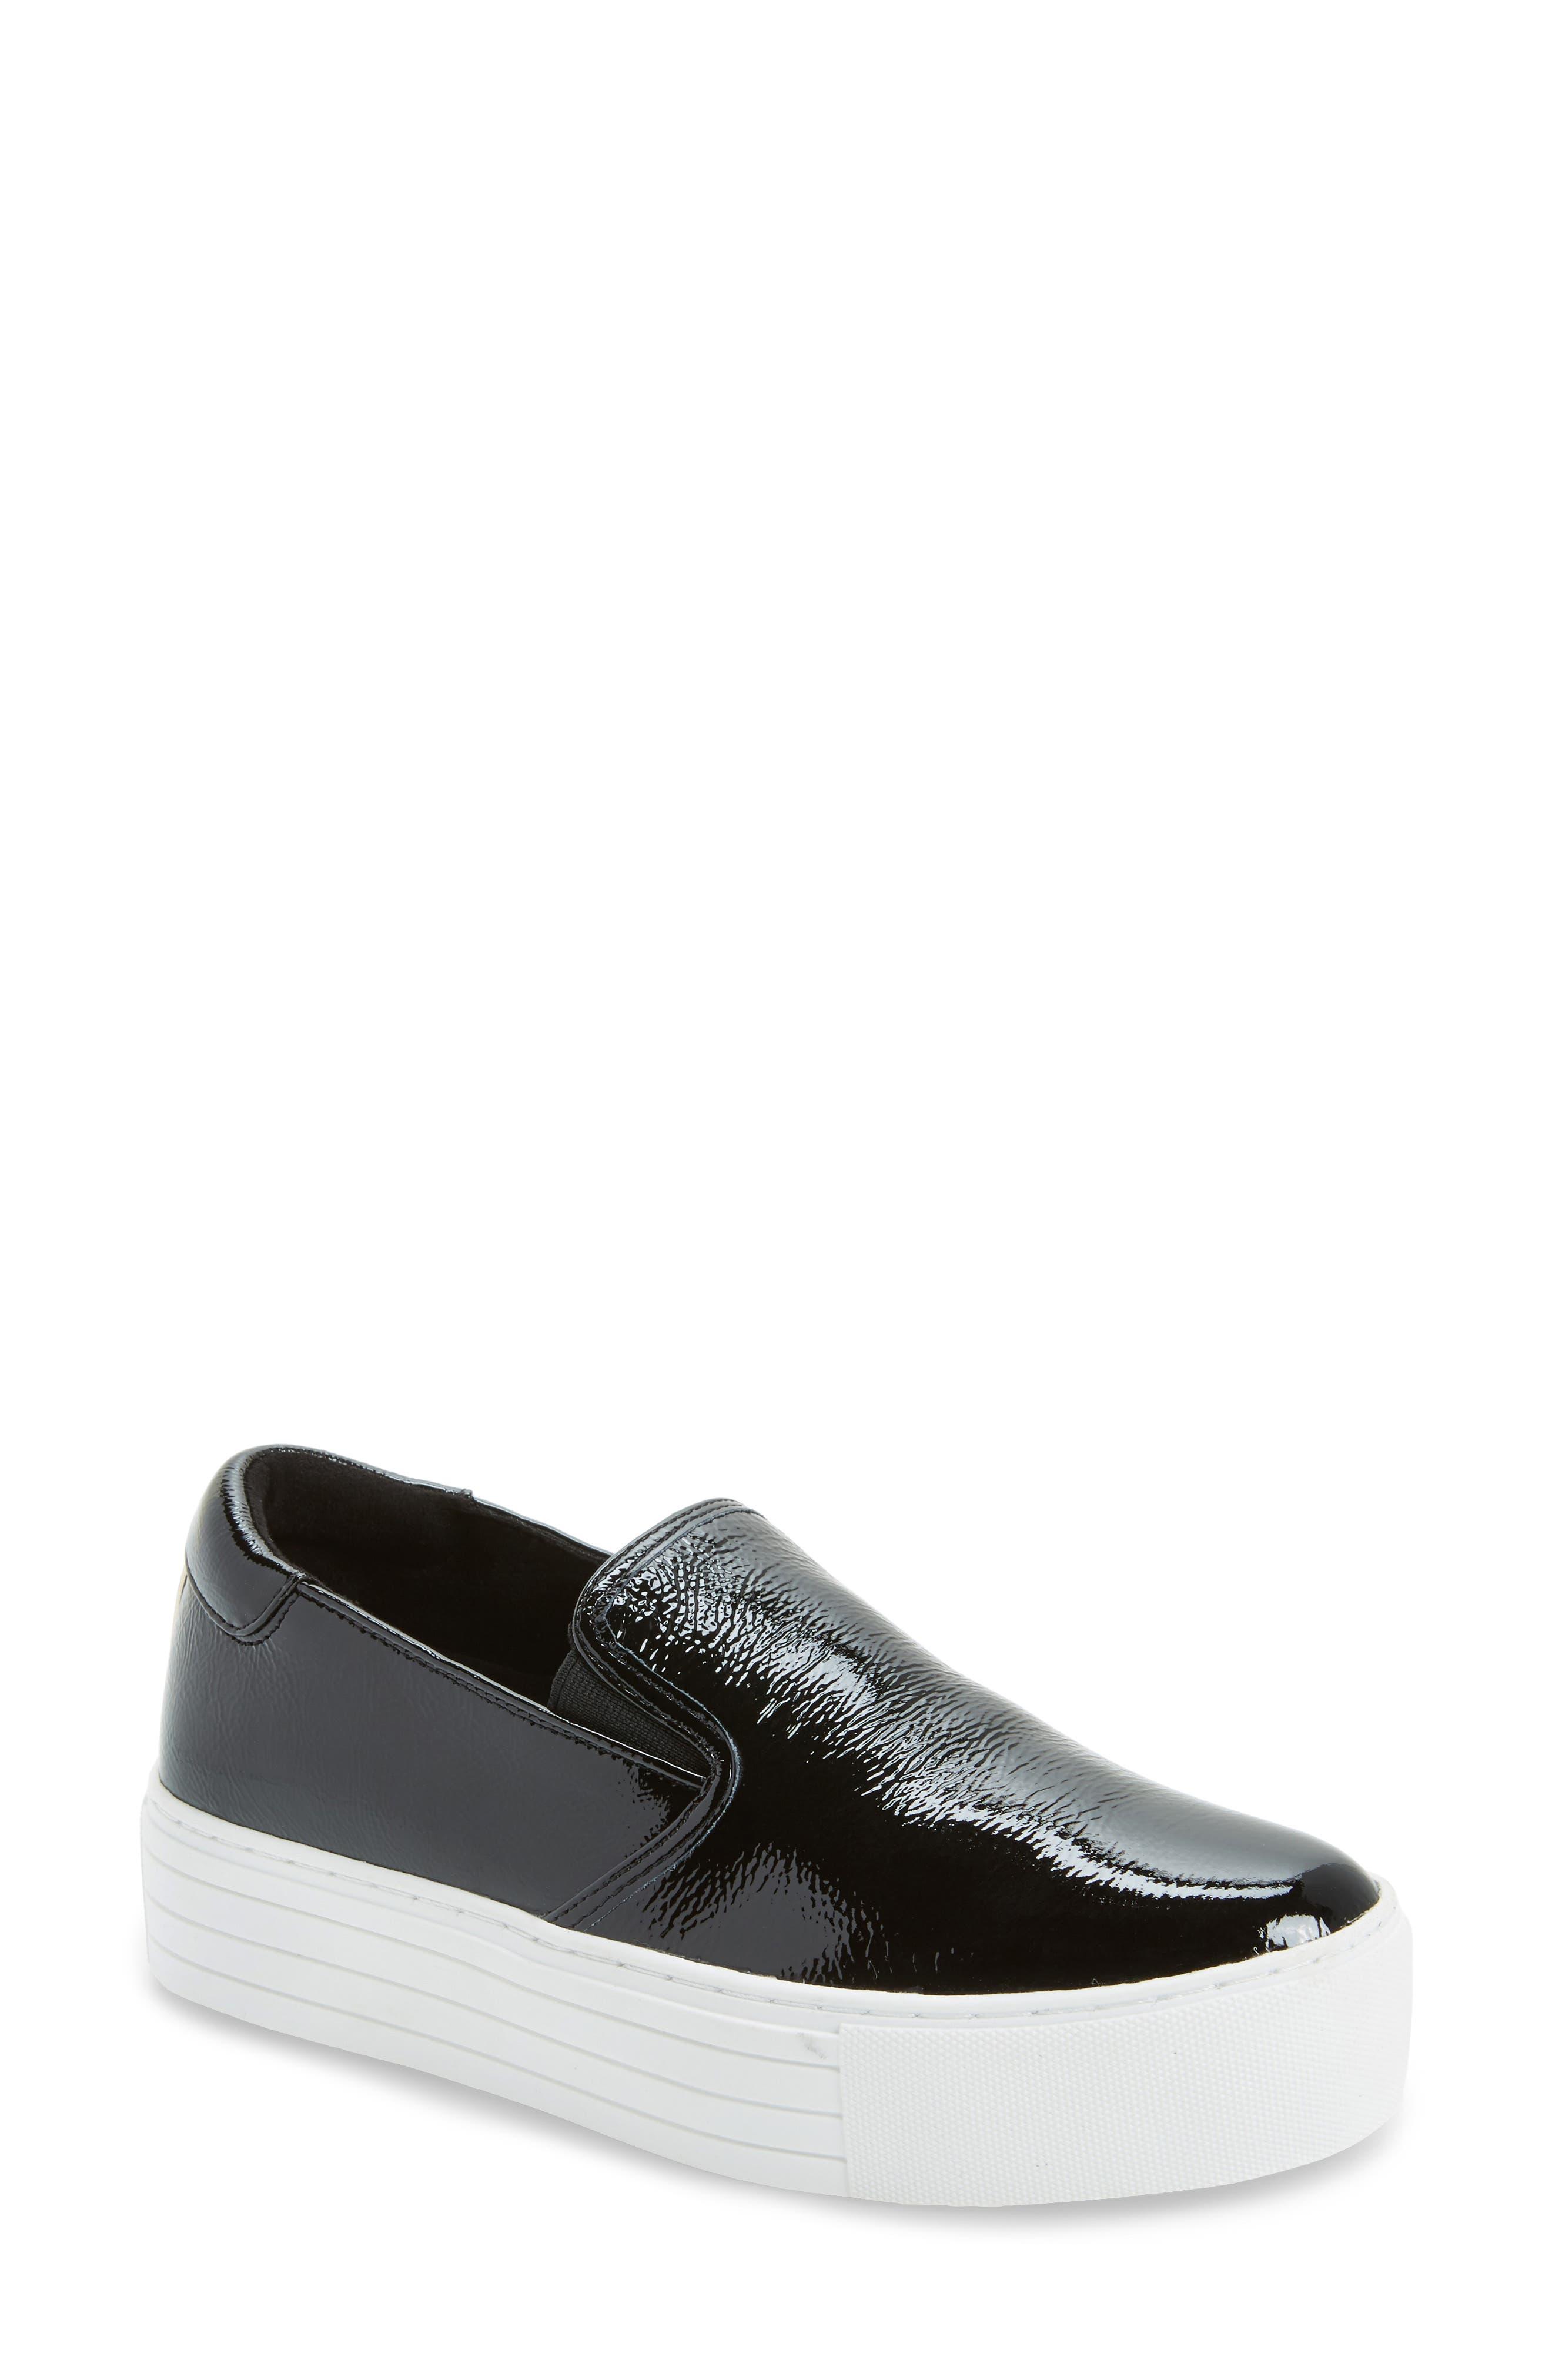 Joanie Slip-On Platform Sneaker,                         Main,                         color, Black Patent Leather